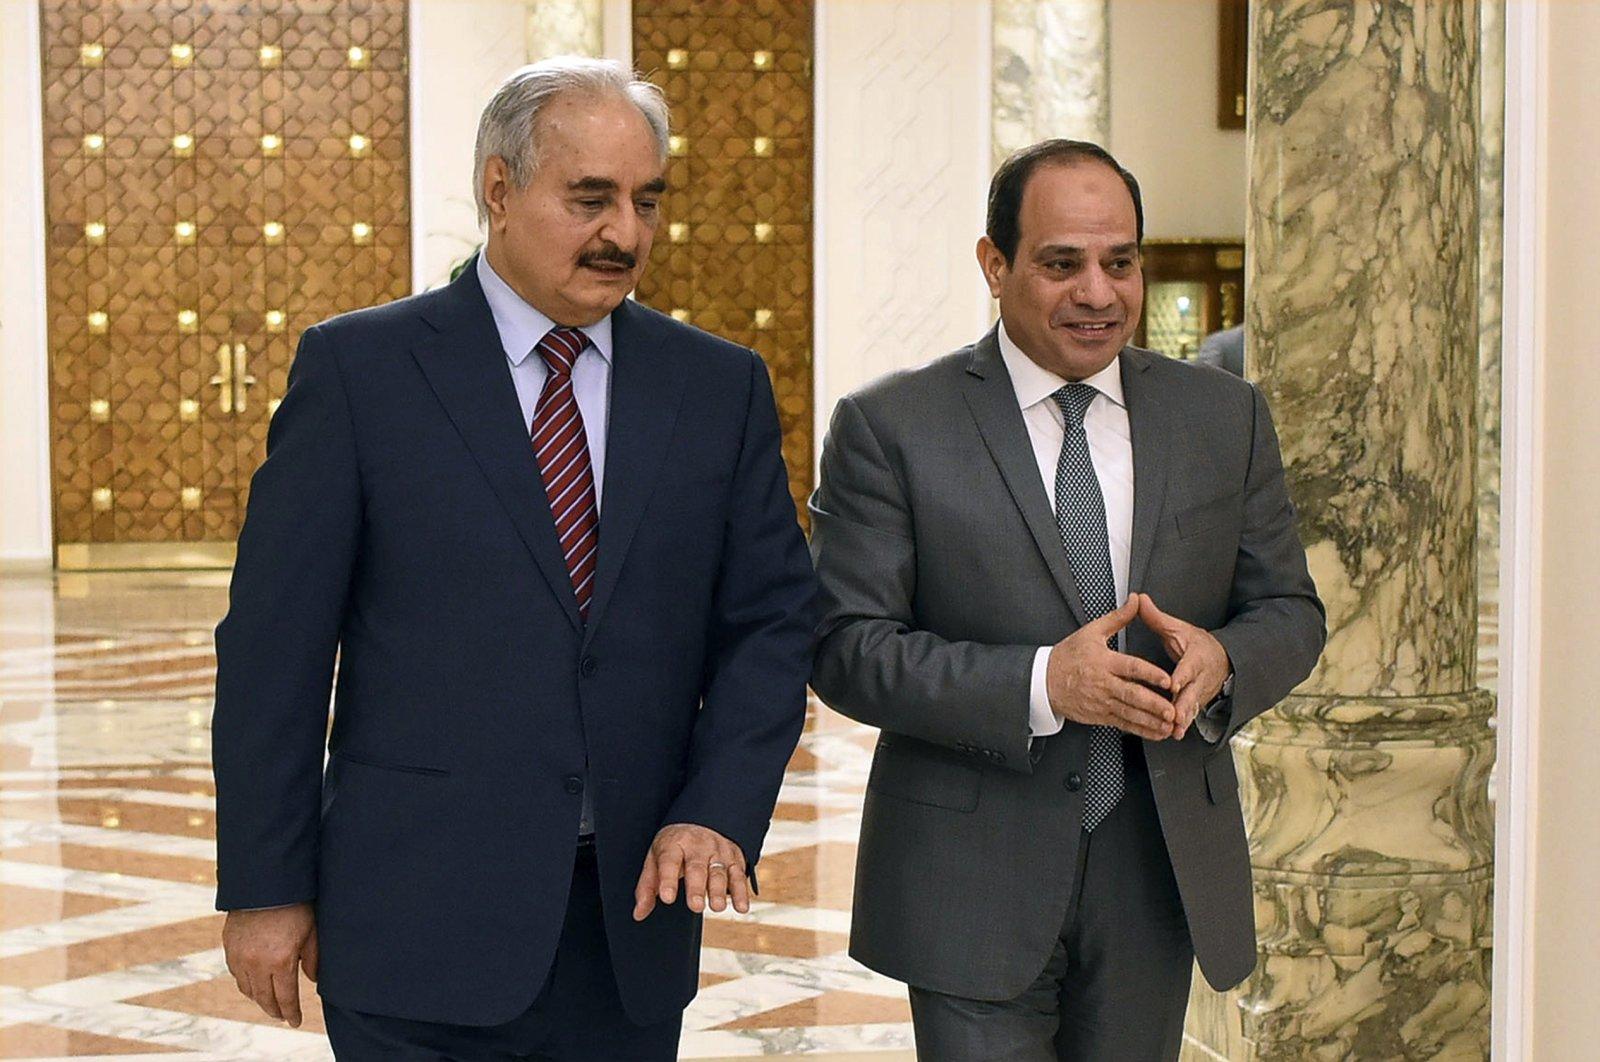 Egyptian President Abdel-Fattah el-Sissi, right, walks with putschist Gen. Khalifa Haftar in Cairo, Egypt, May 9, 2019. (Egyptian Presidency Media office via AP)